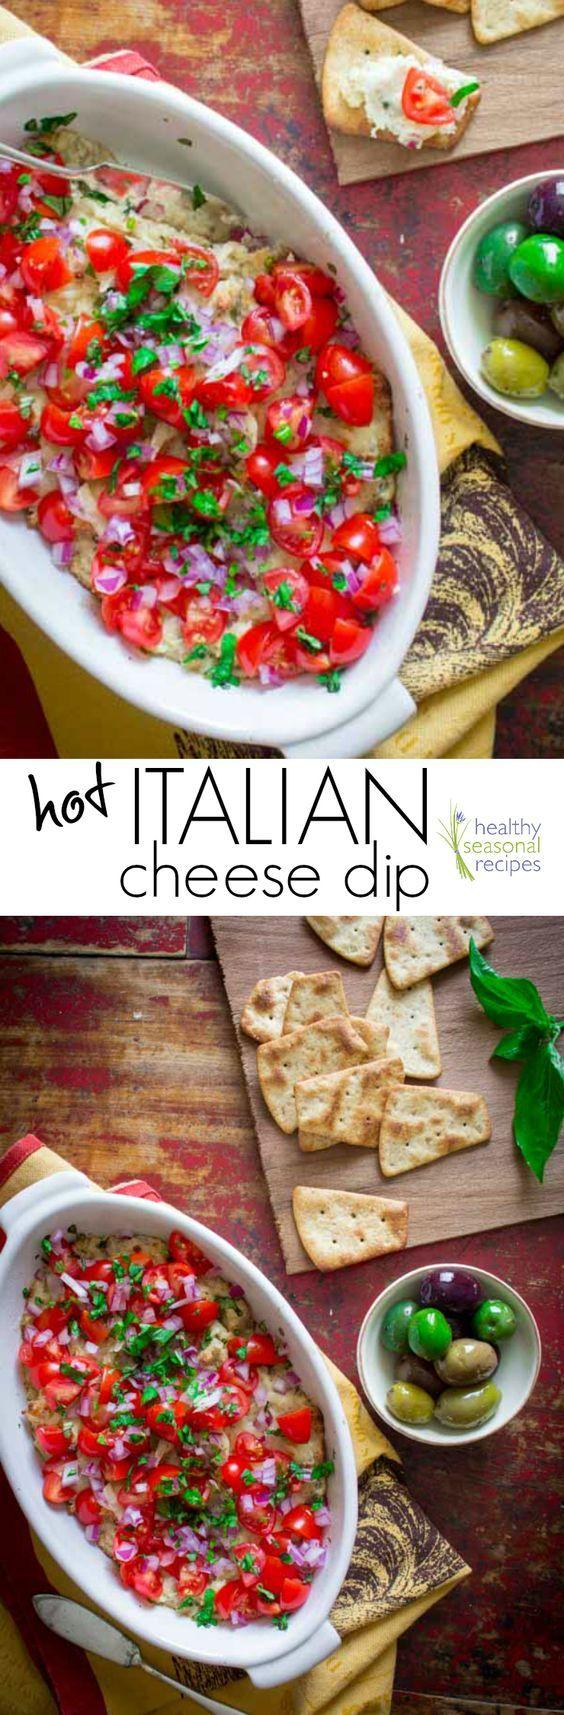 hot italian cheese dip  -  #Cheese #Dip #Hot #Italian #italianCheeseSoup